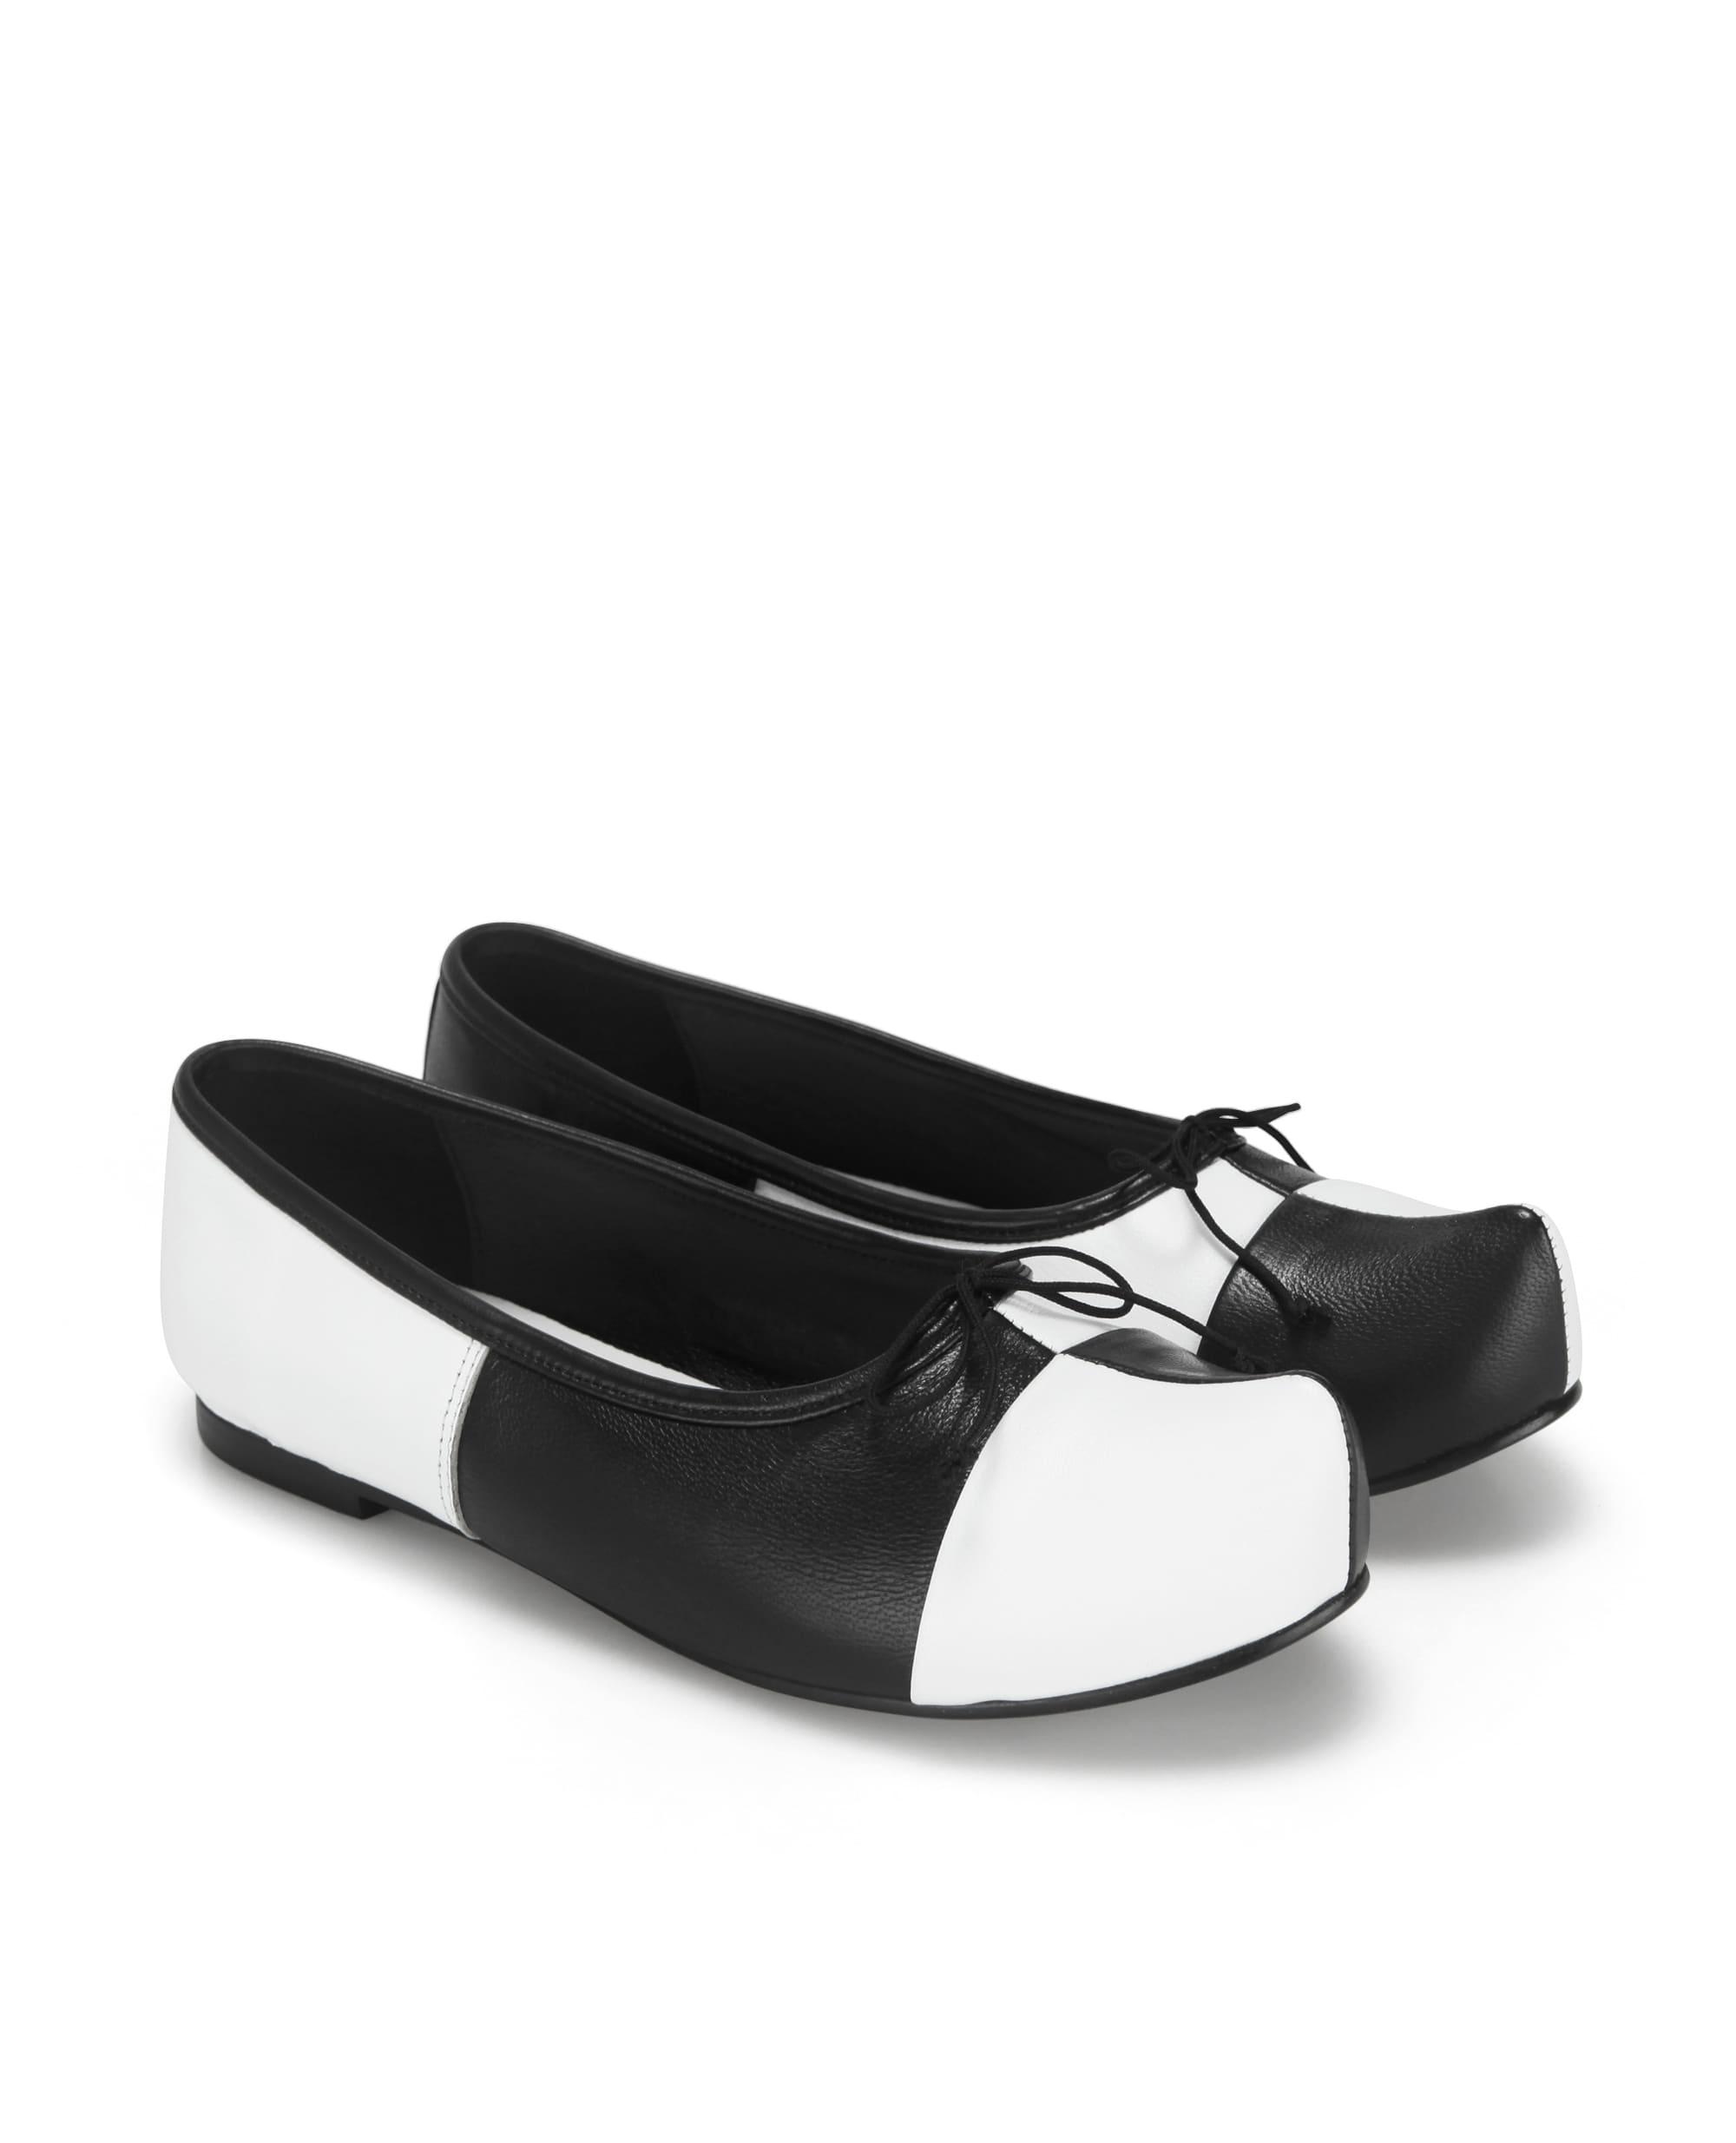 Pointed Toe Ballerina Flats | Checkerboard